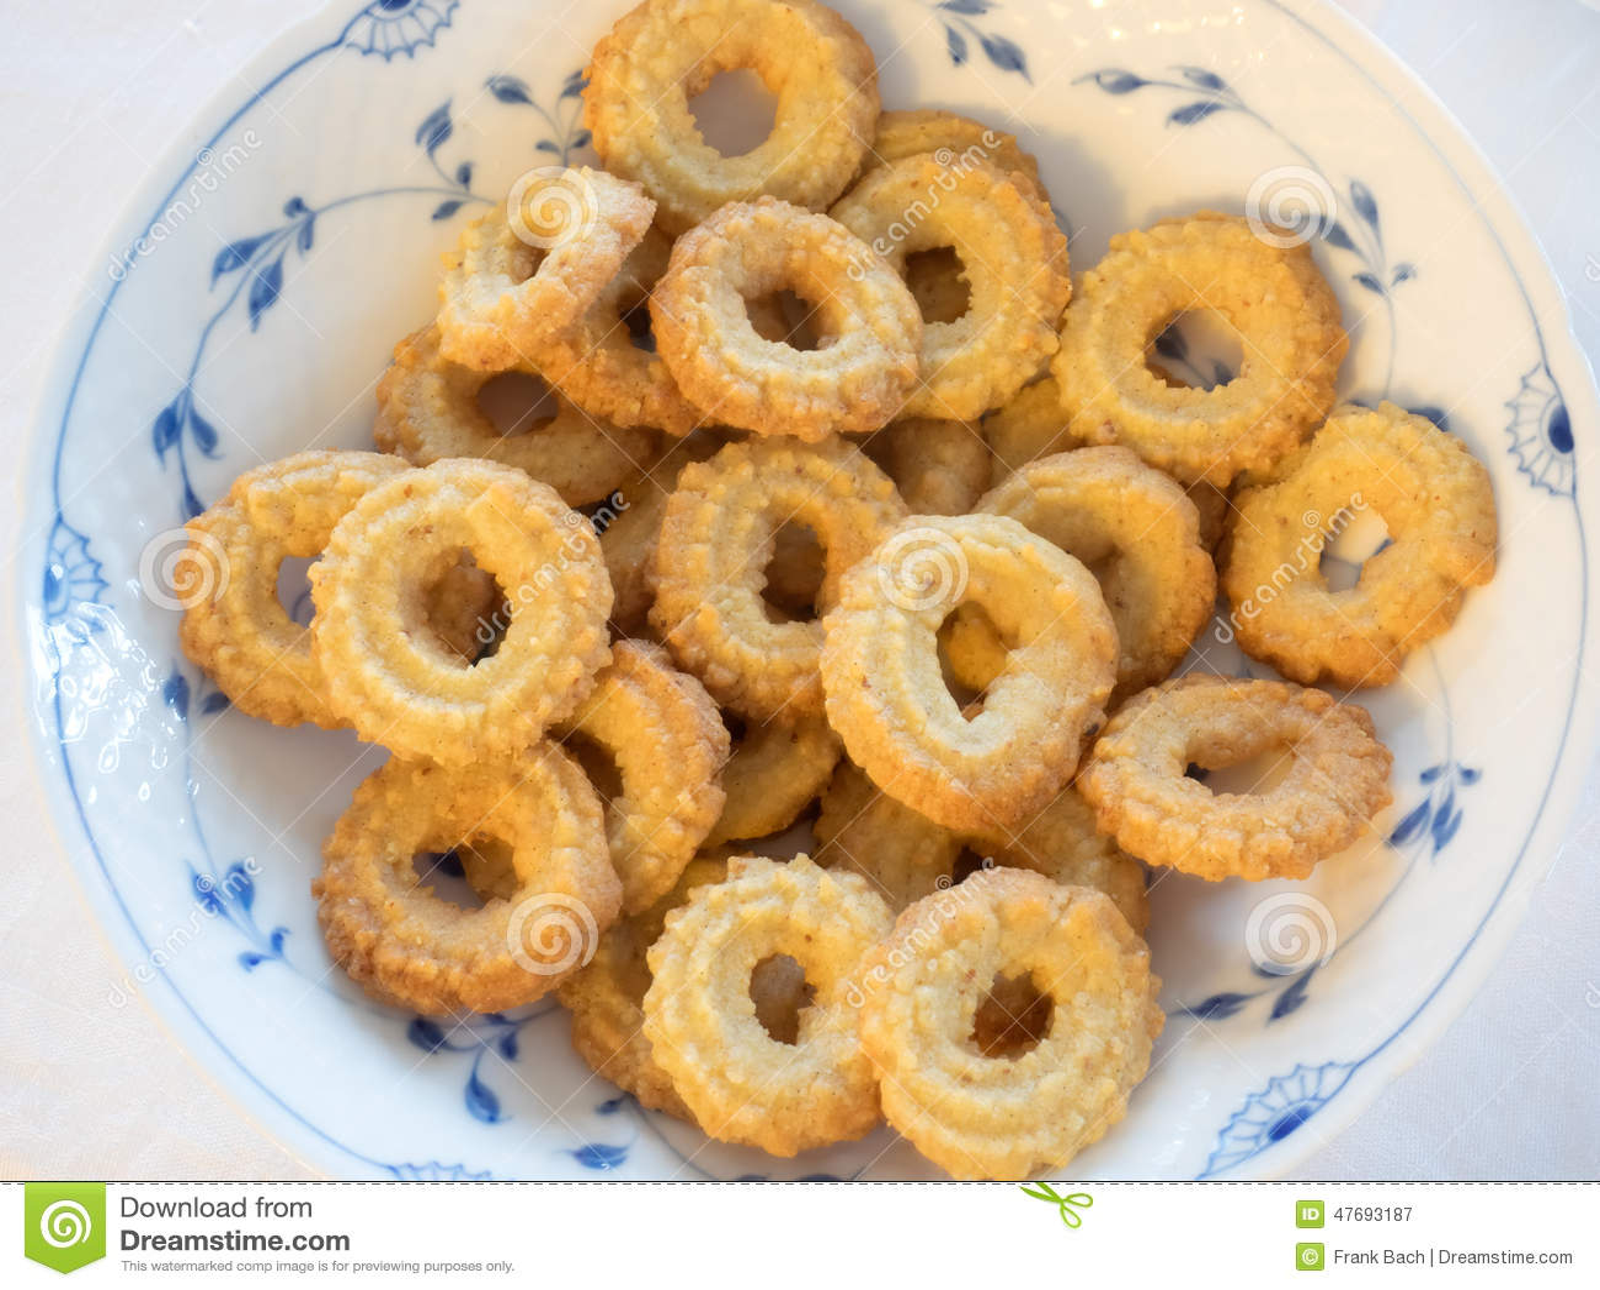 how to make homemade vanilla cookies